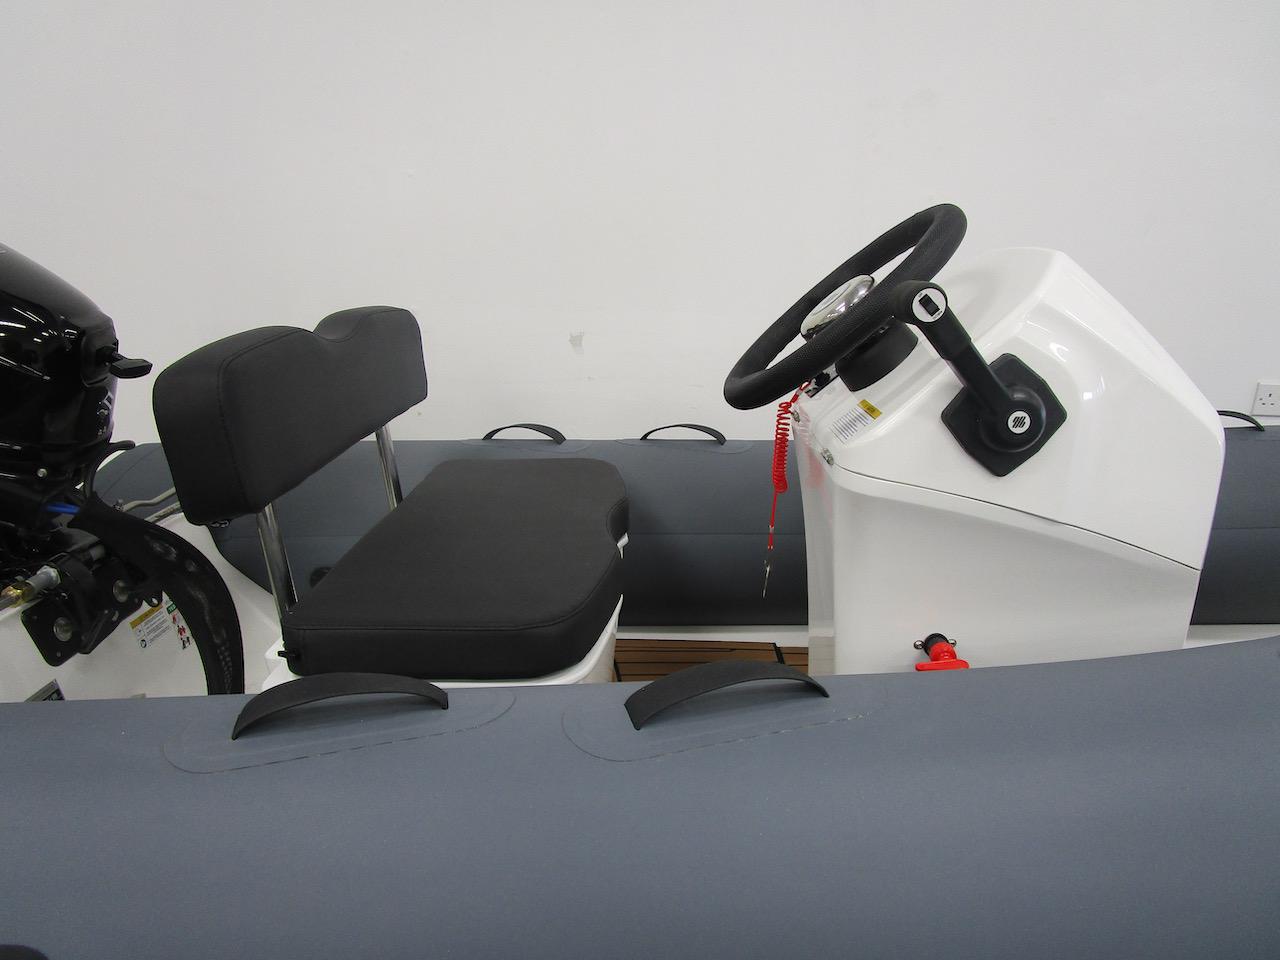 GRAND S330 RIB tender helm seat